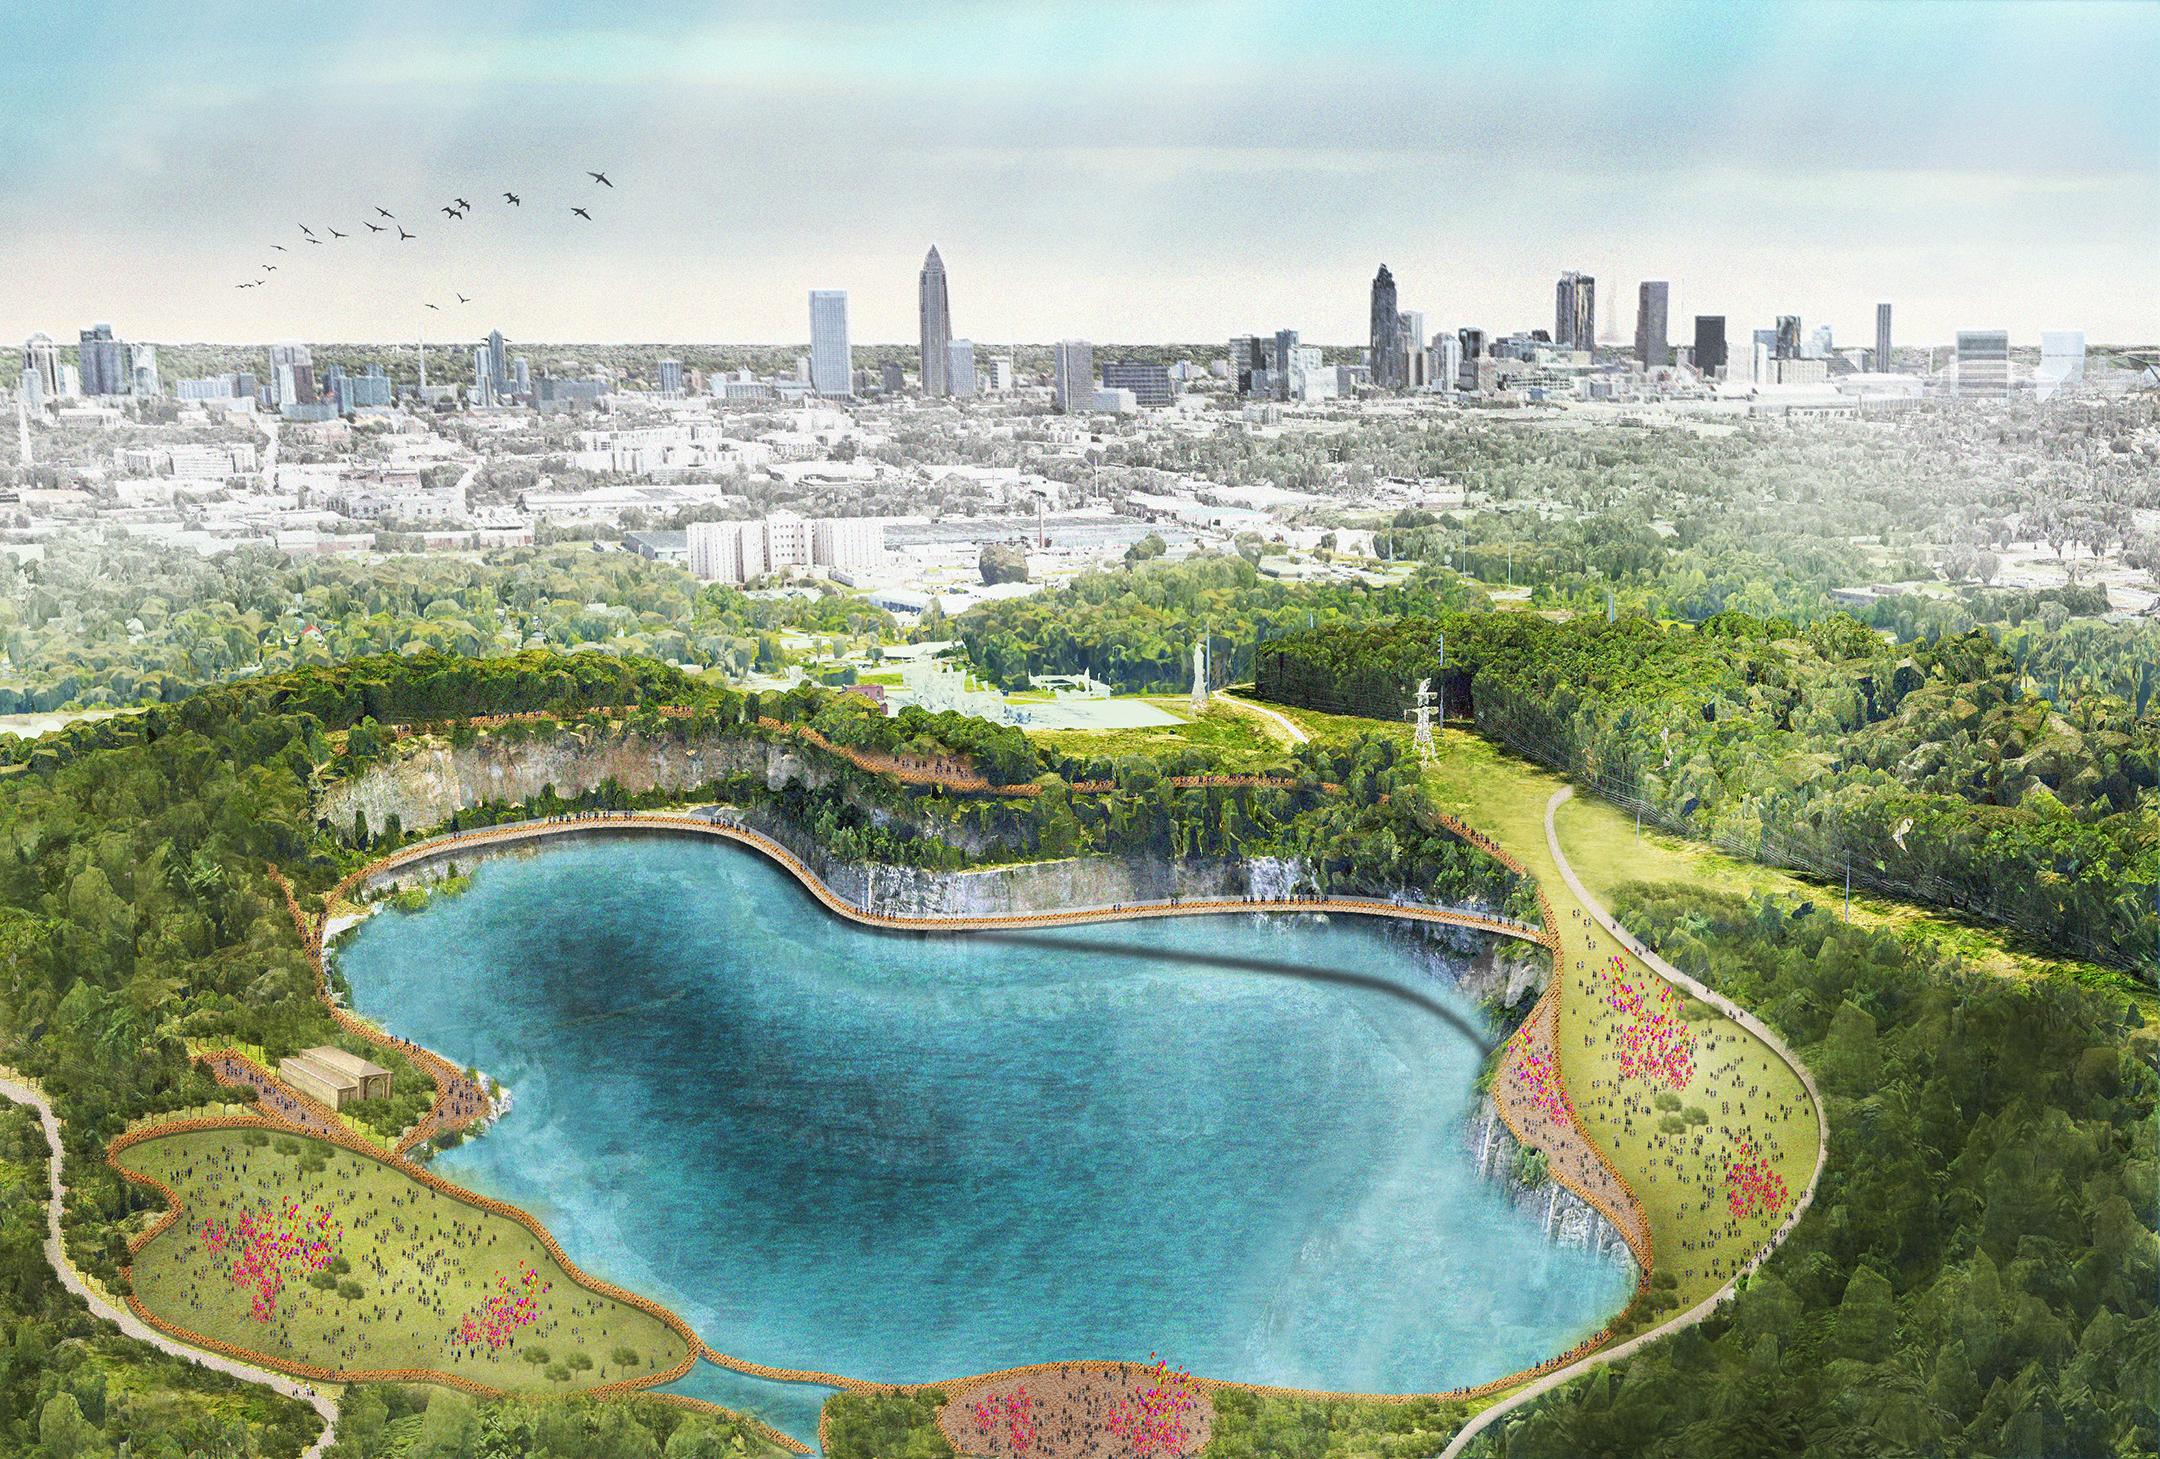 Proposed park design plan